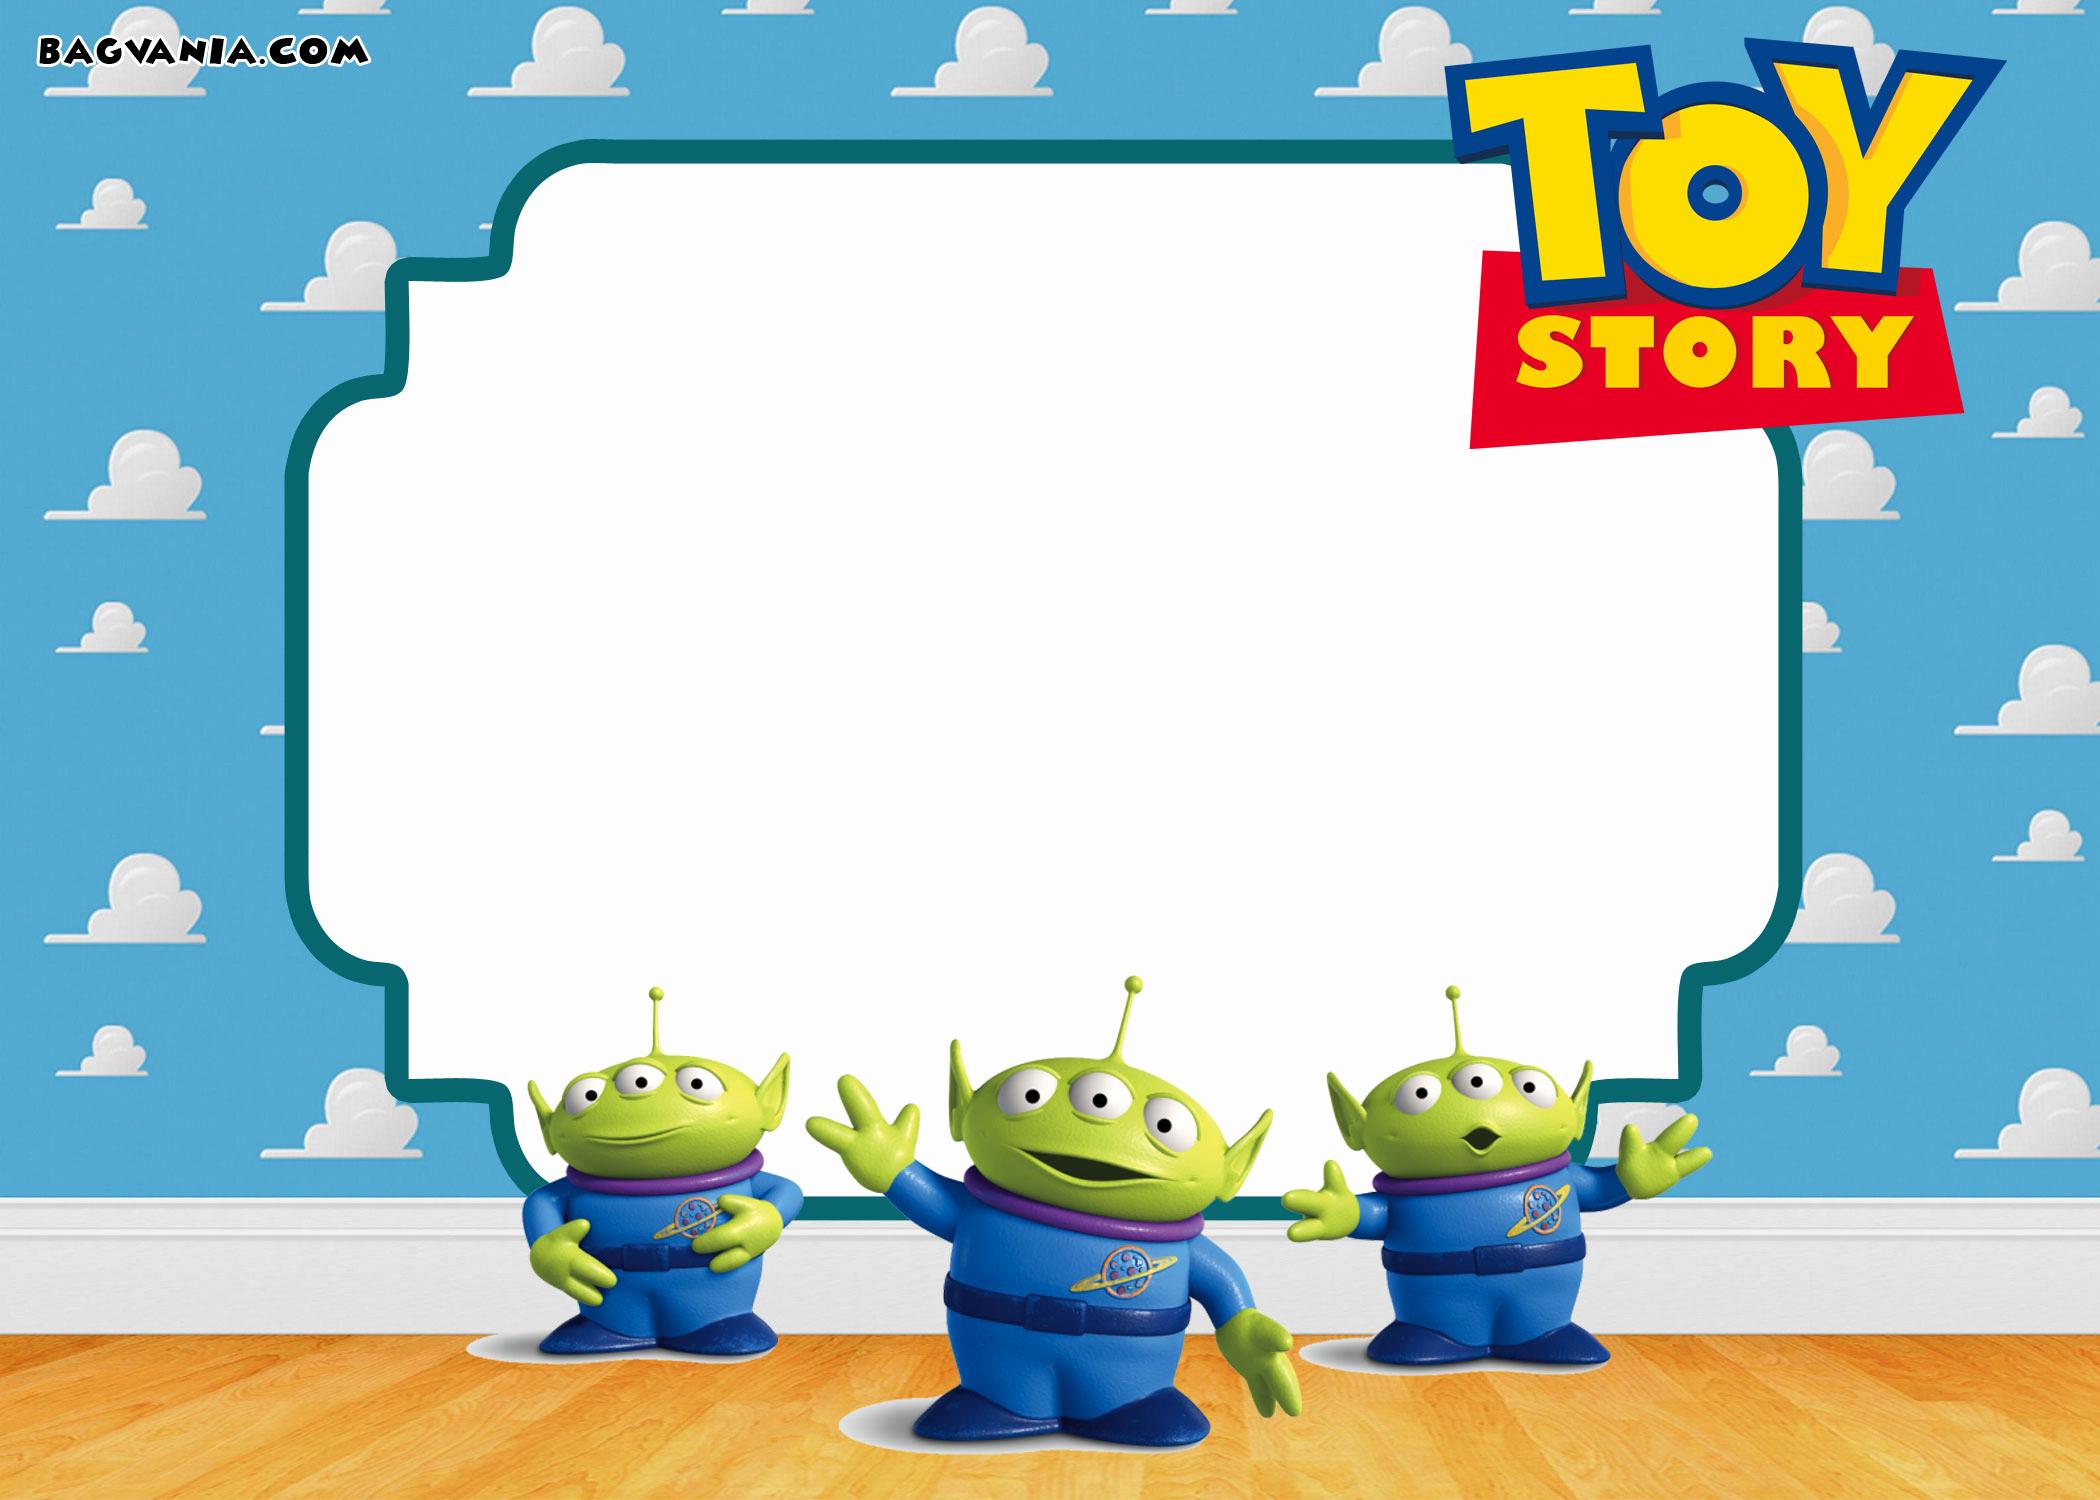 Toy Story Invitation Templates Free Inspirational Free Printable toy Story Birthday Invitations – Free